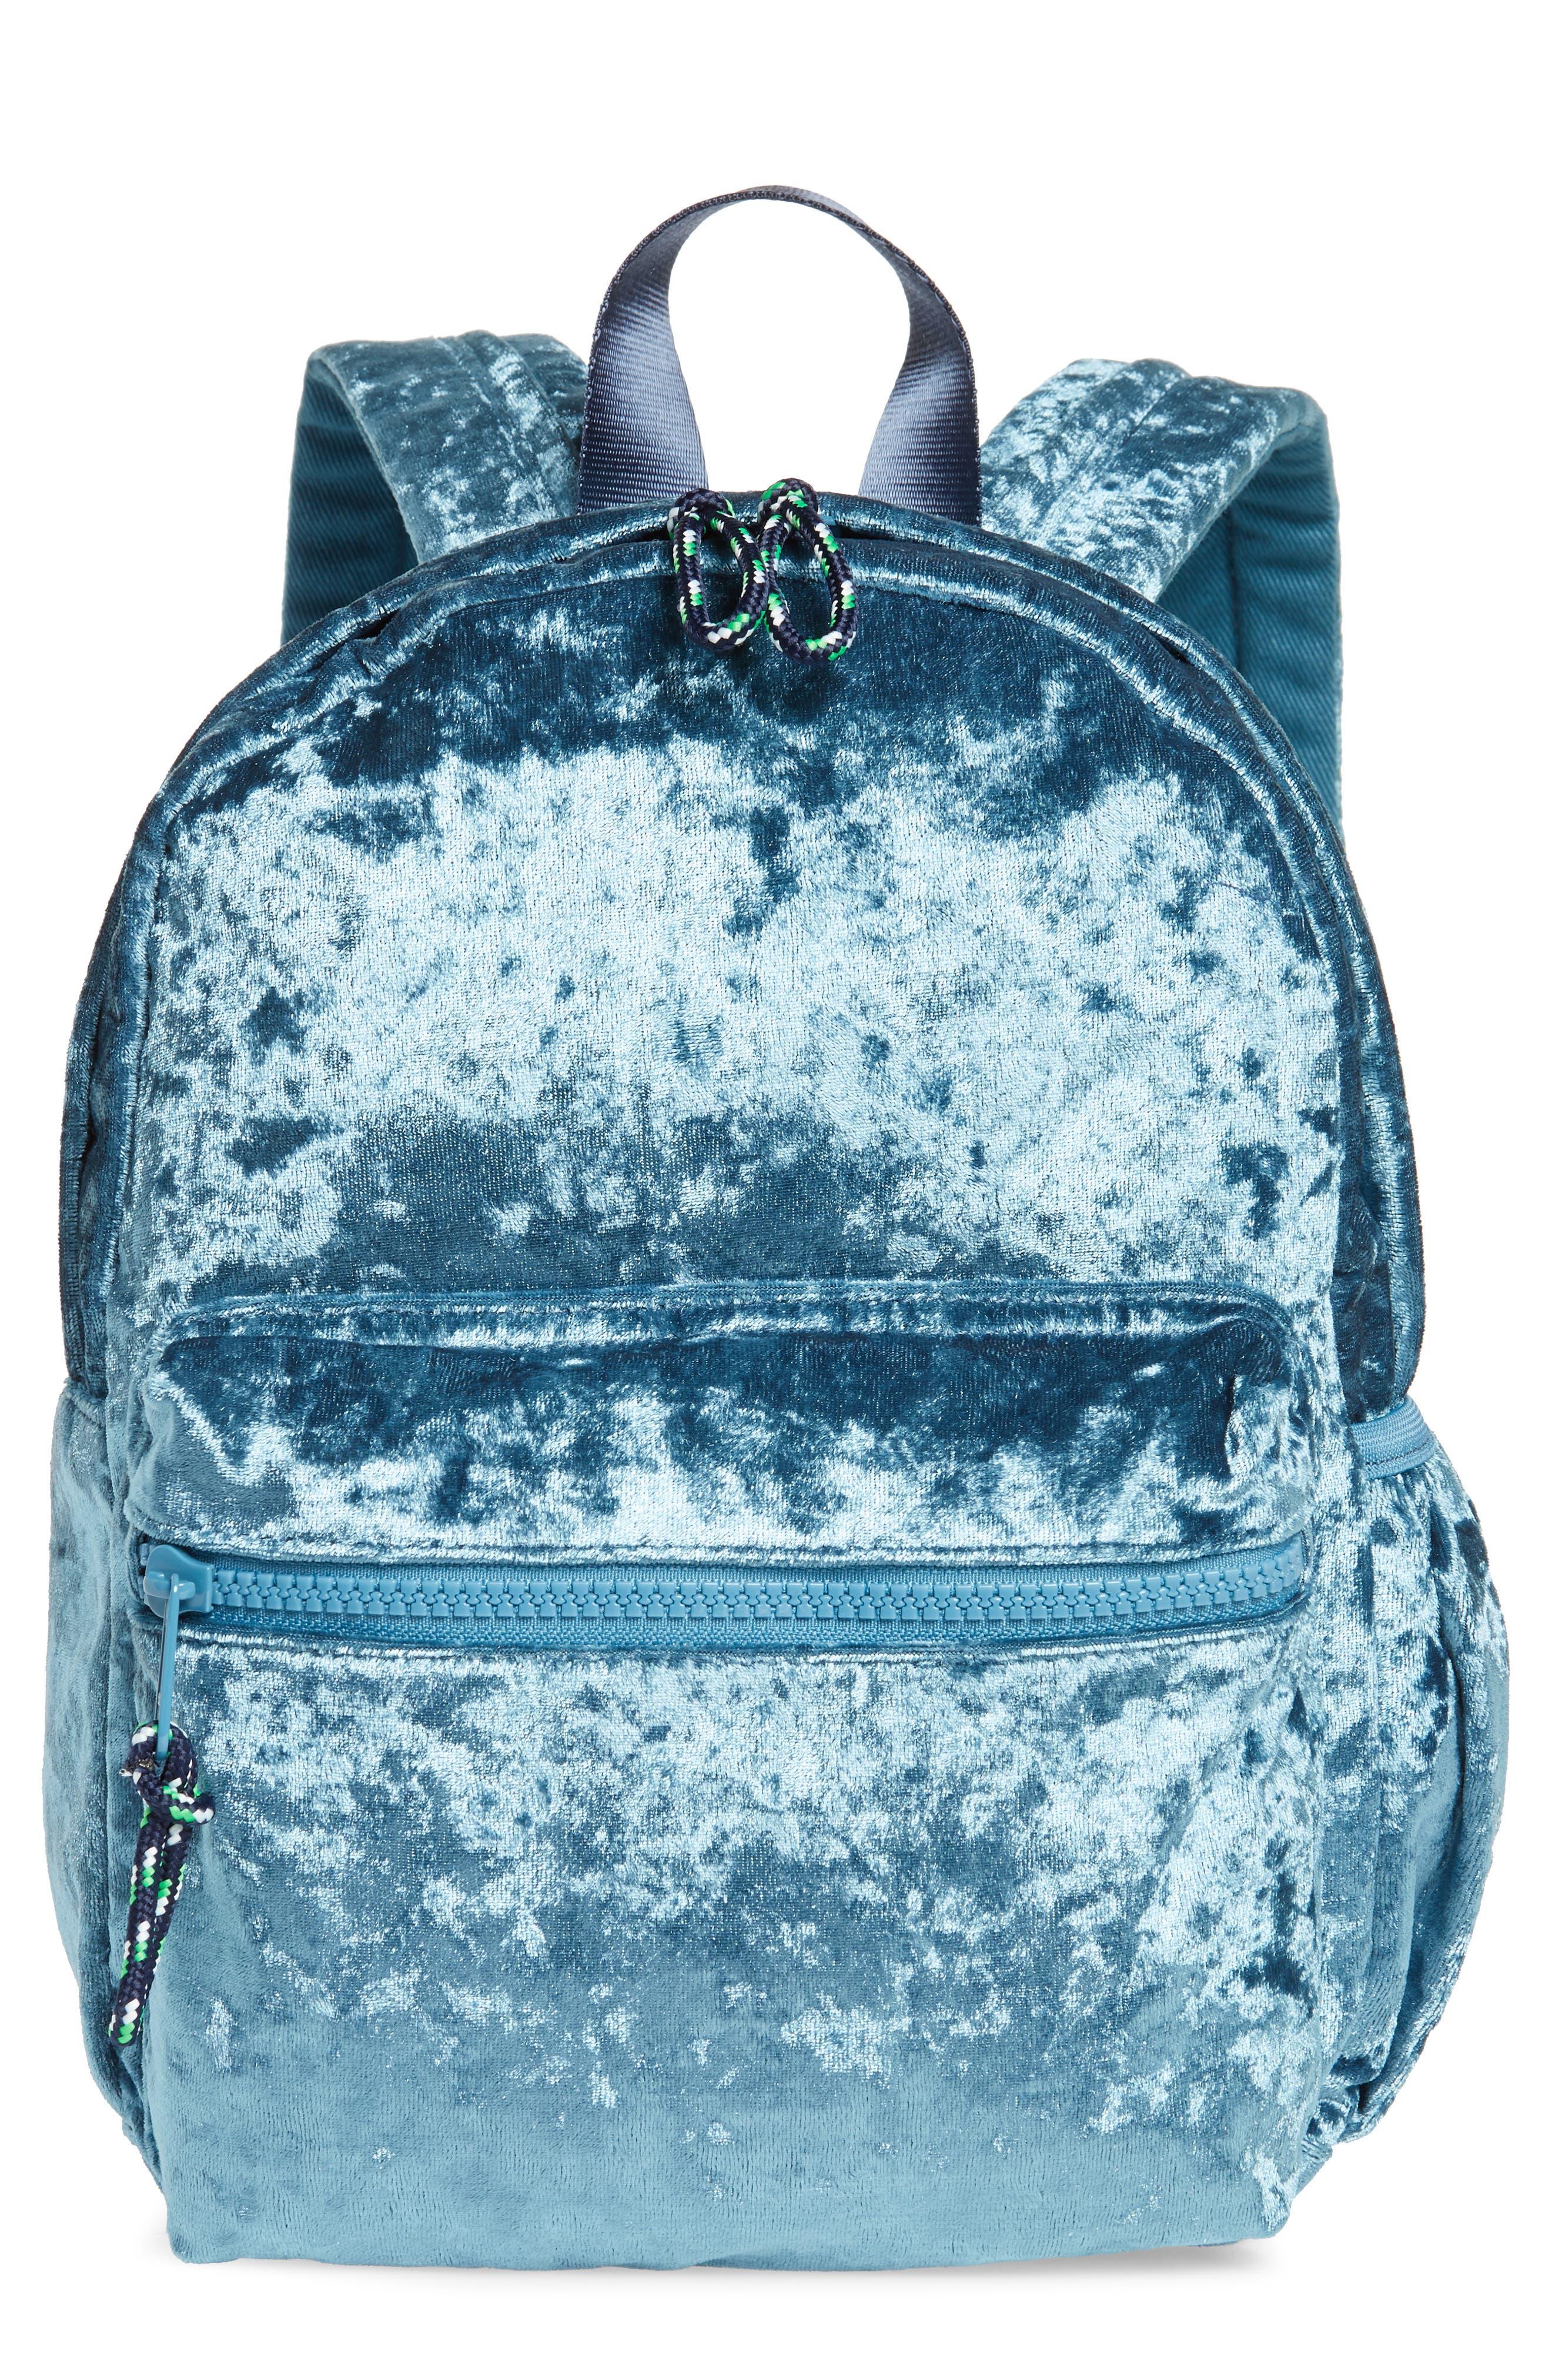 Crushed Velvet Backpack,                             Main thumbnail 1, color,                             Brilliant Turquoise